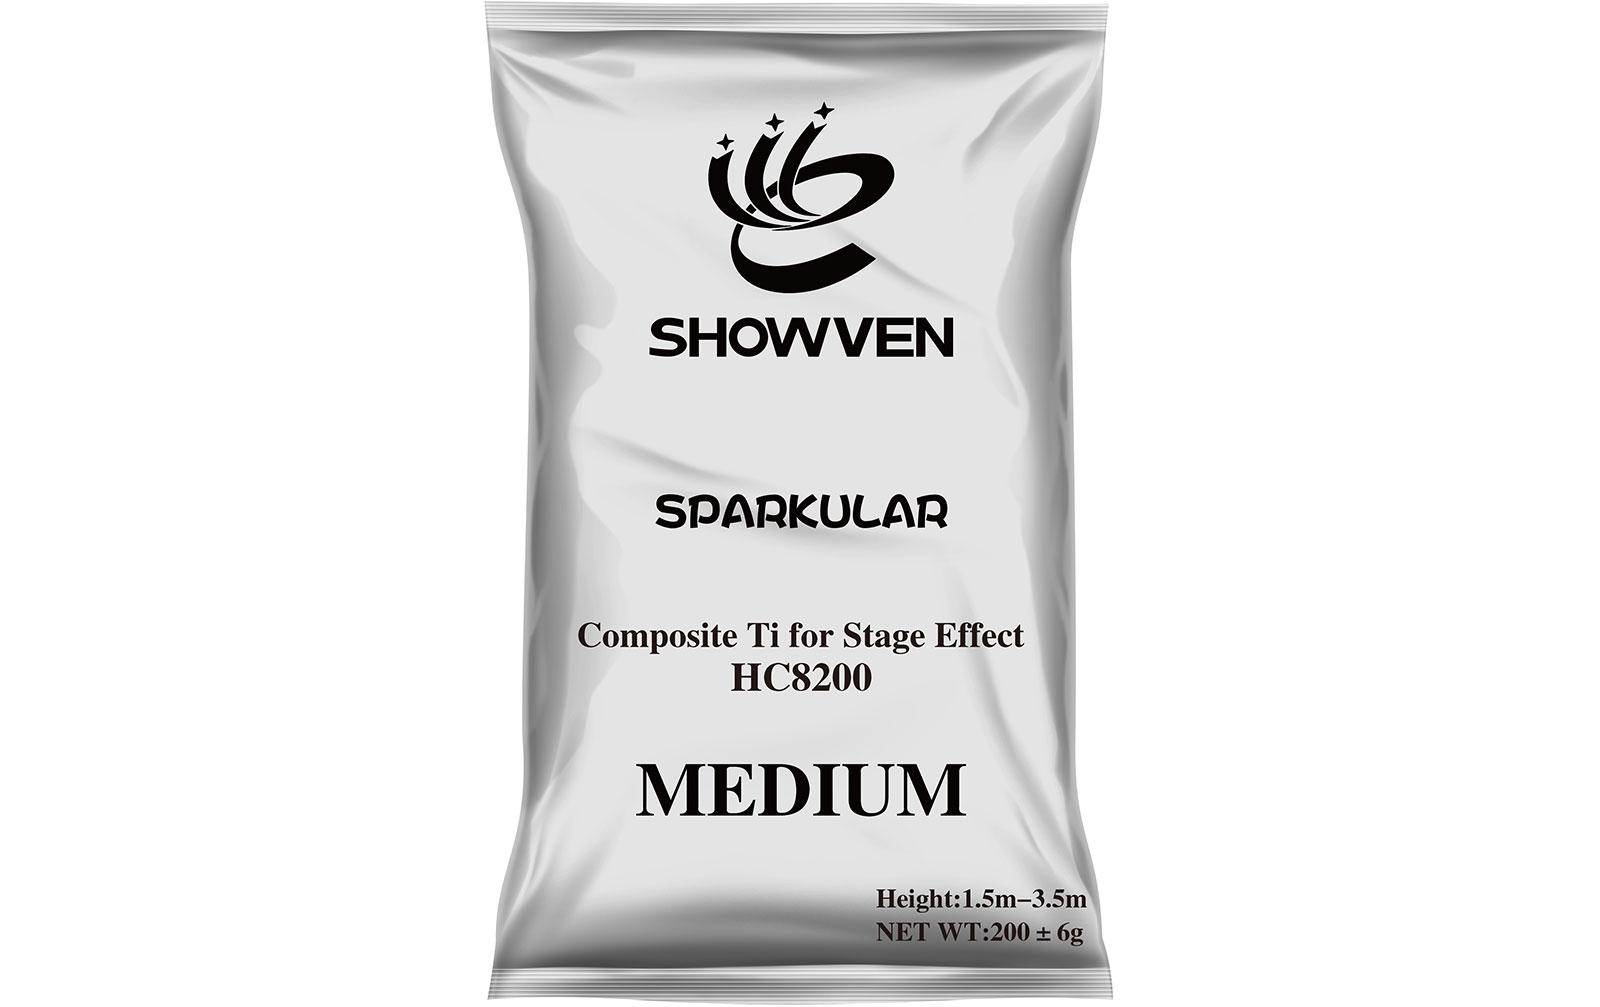 showven-sparkular-granulat-hc8200-m